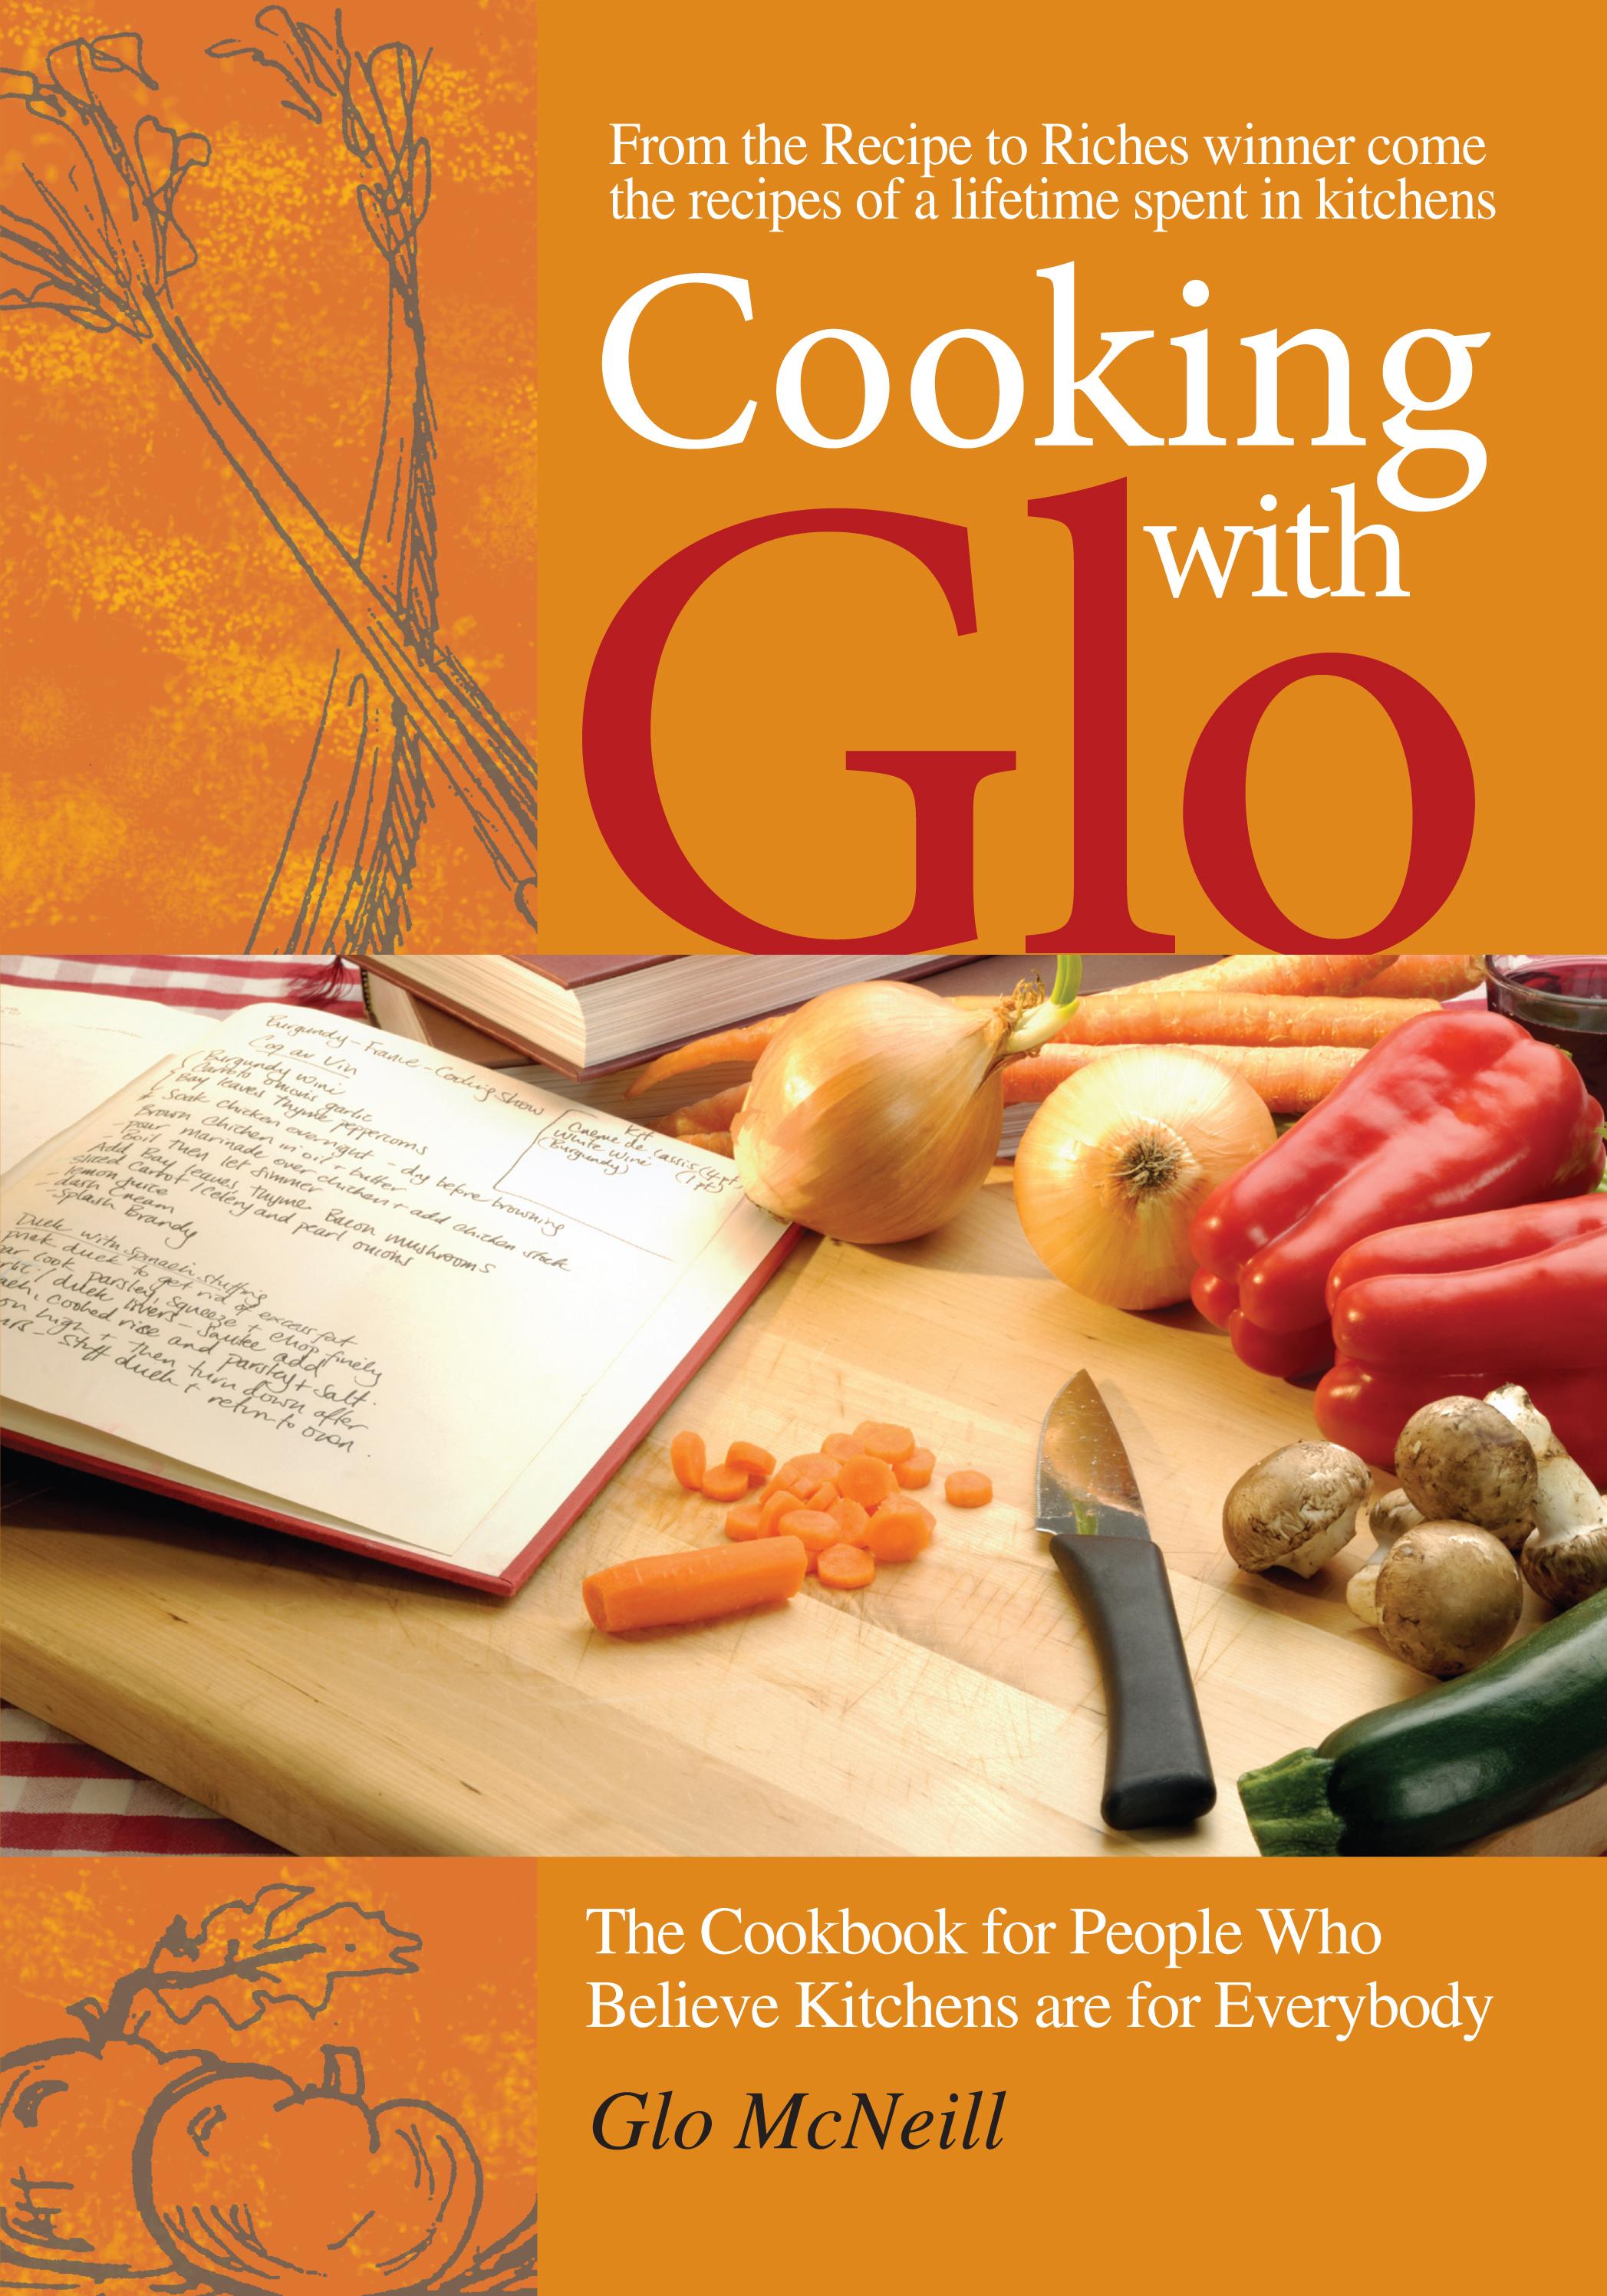 Glocookbook_cover2012.indd